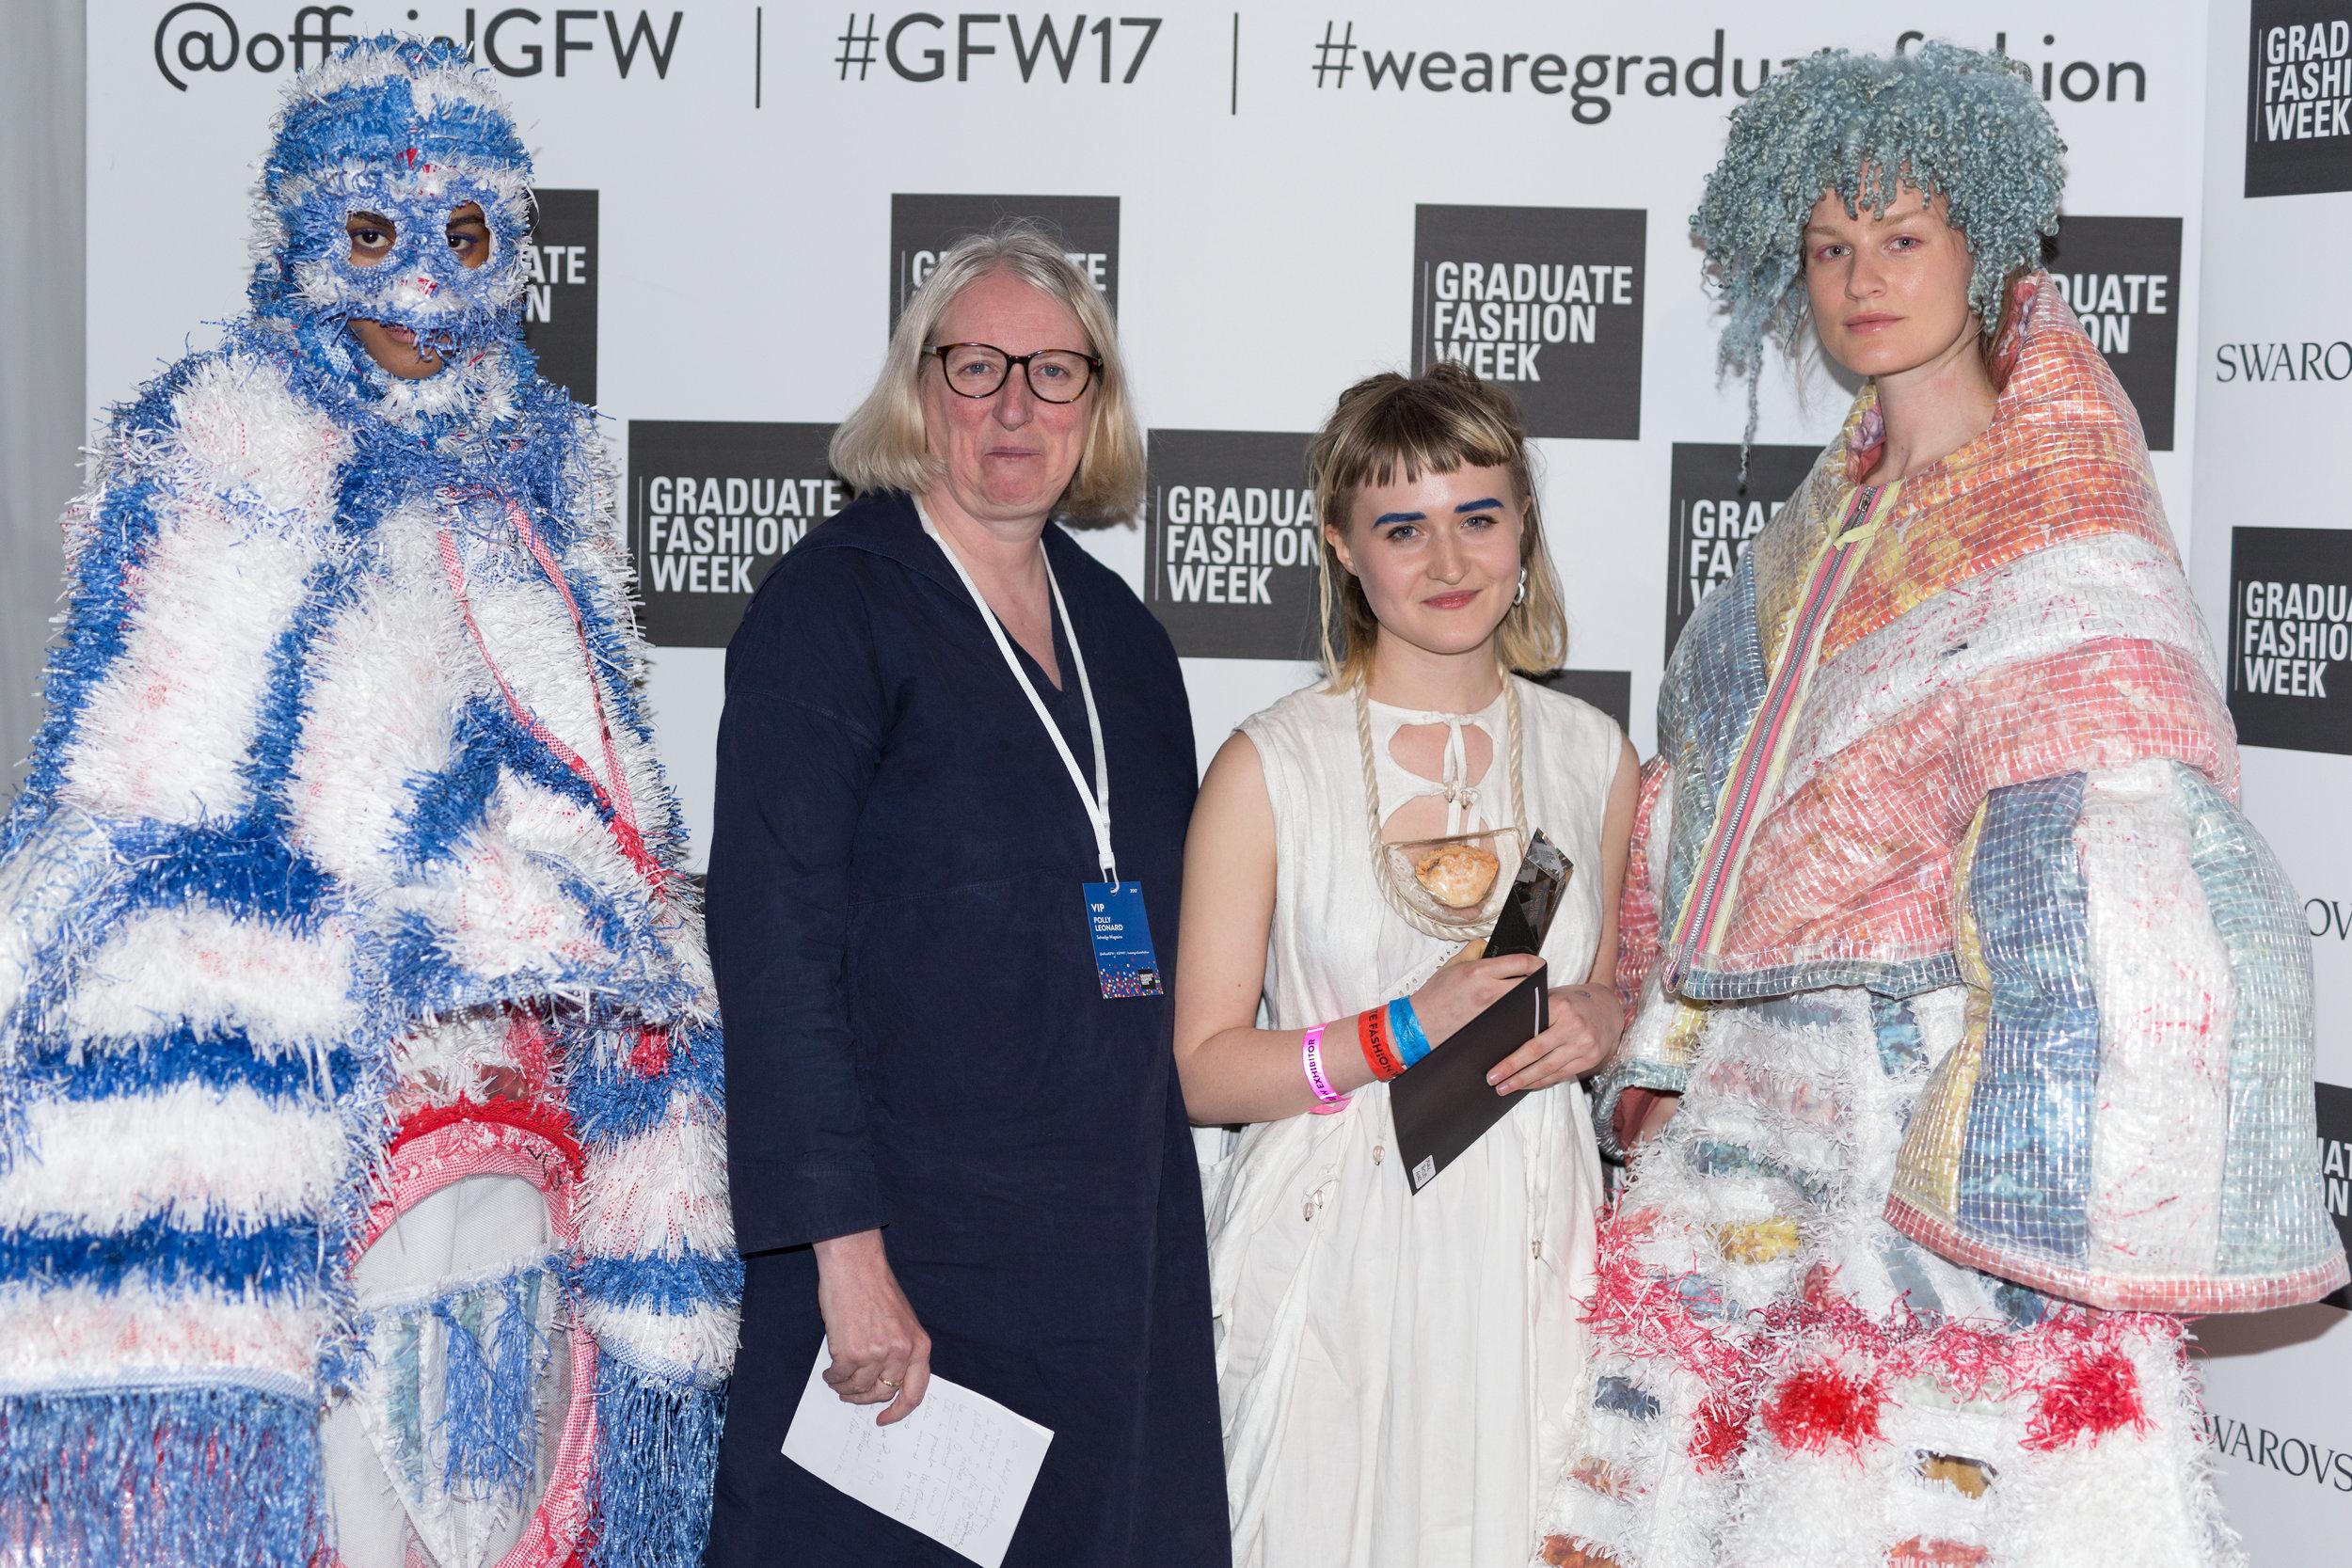 (Maddie Williams, Polly Leonard Selvedge Magazine Editor) (Edinburgh College of Art) (Catwalk Textile Award) (07-06-2017) (image by Qavi Reyez)_-2.jpg